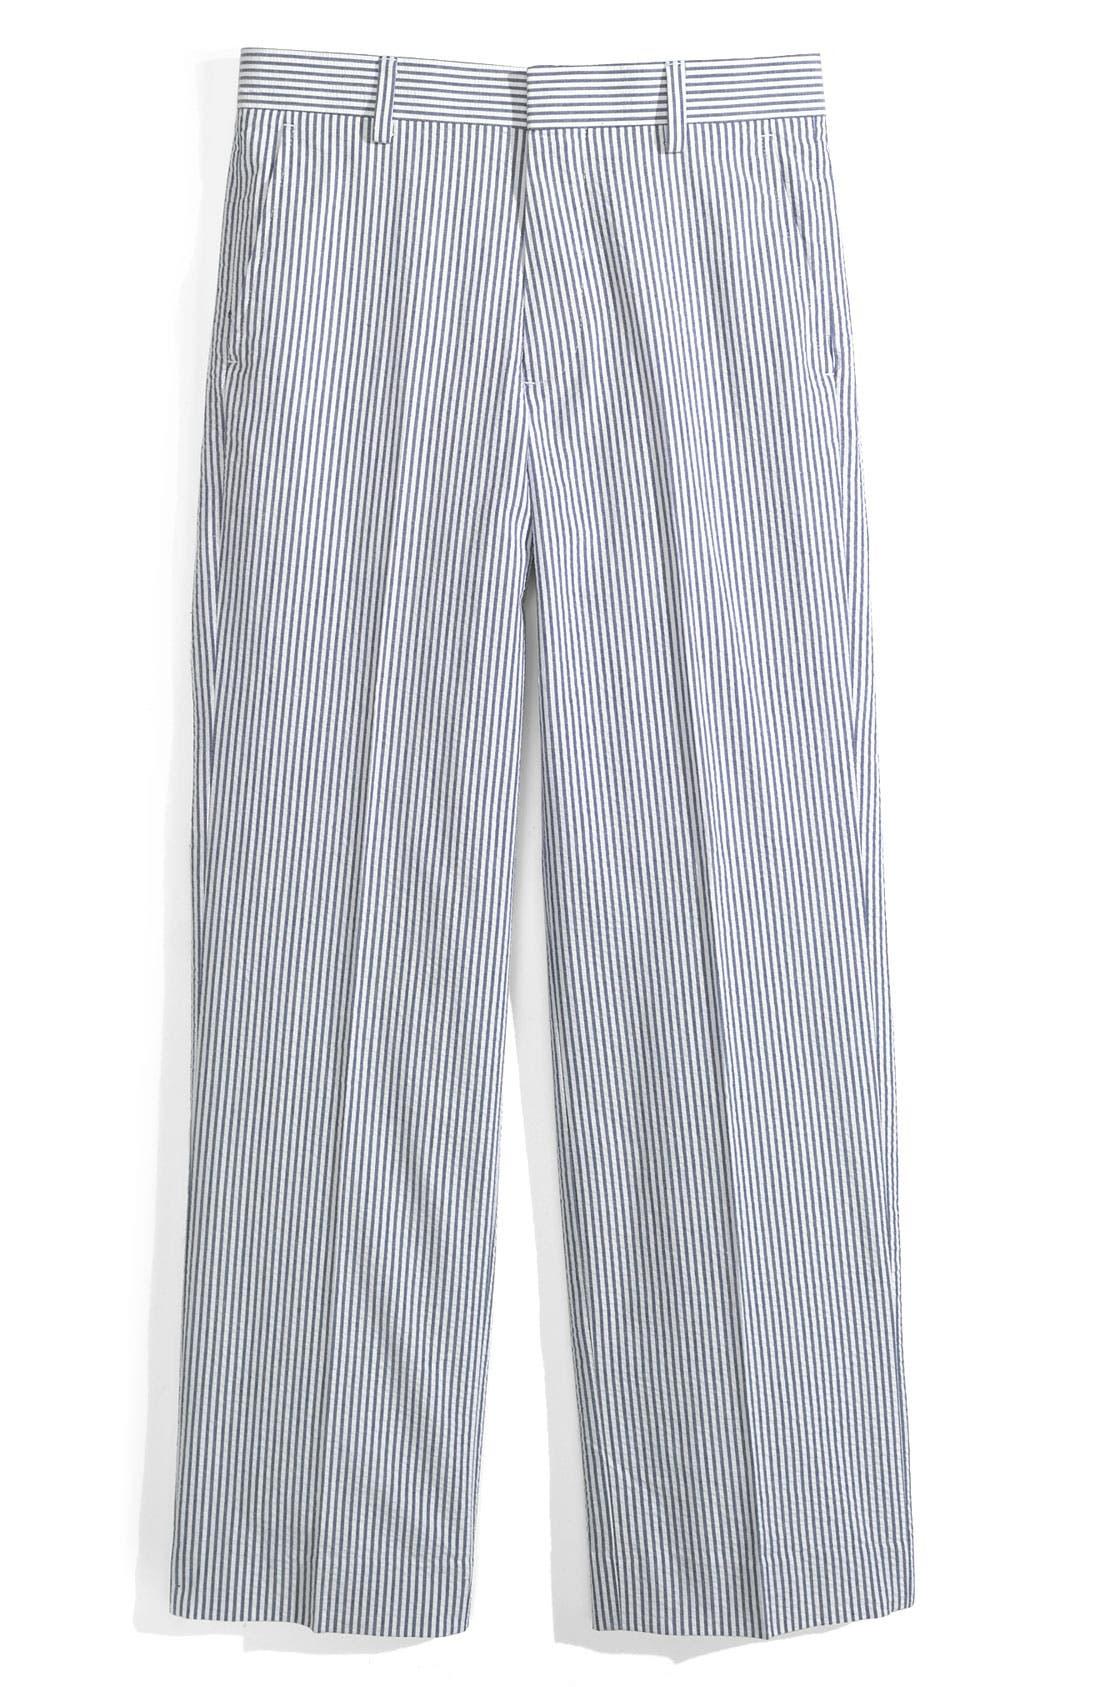 Seersucker Pants,                             Main thumbnail 1, color,                             400